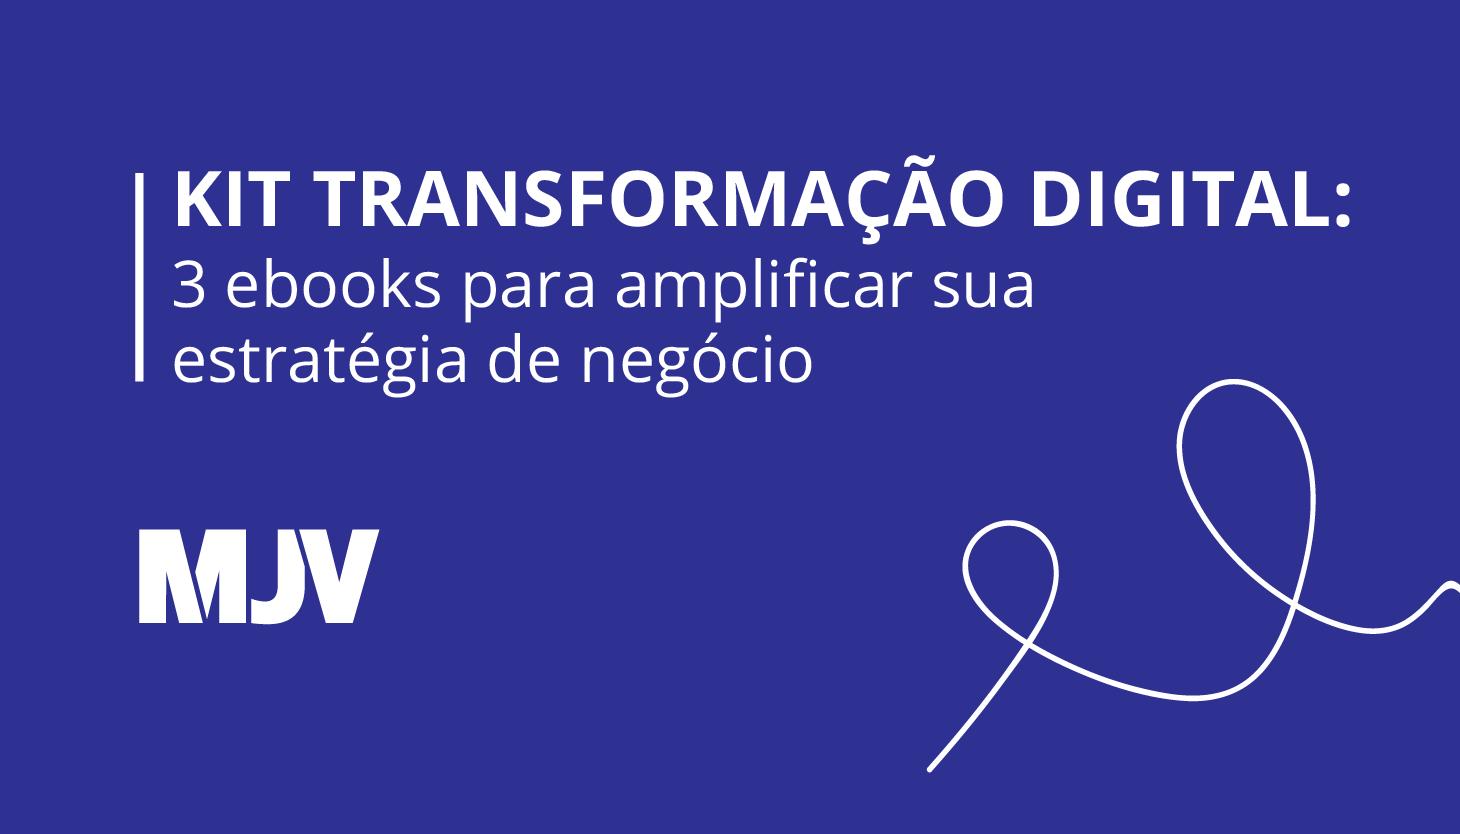 KitTransformacaoDigital_CTAemail.png